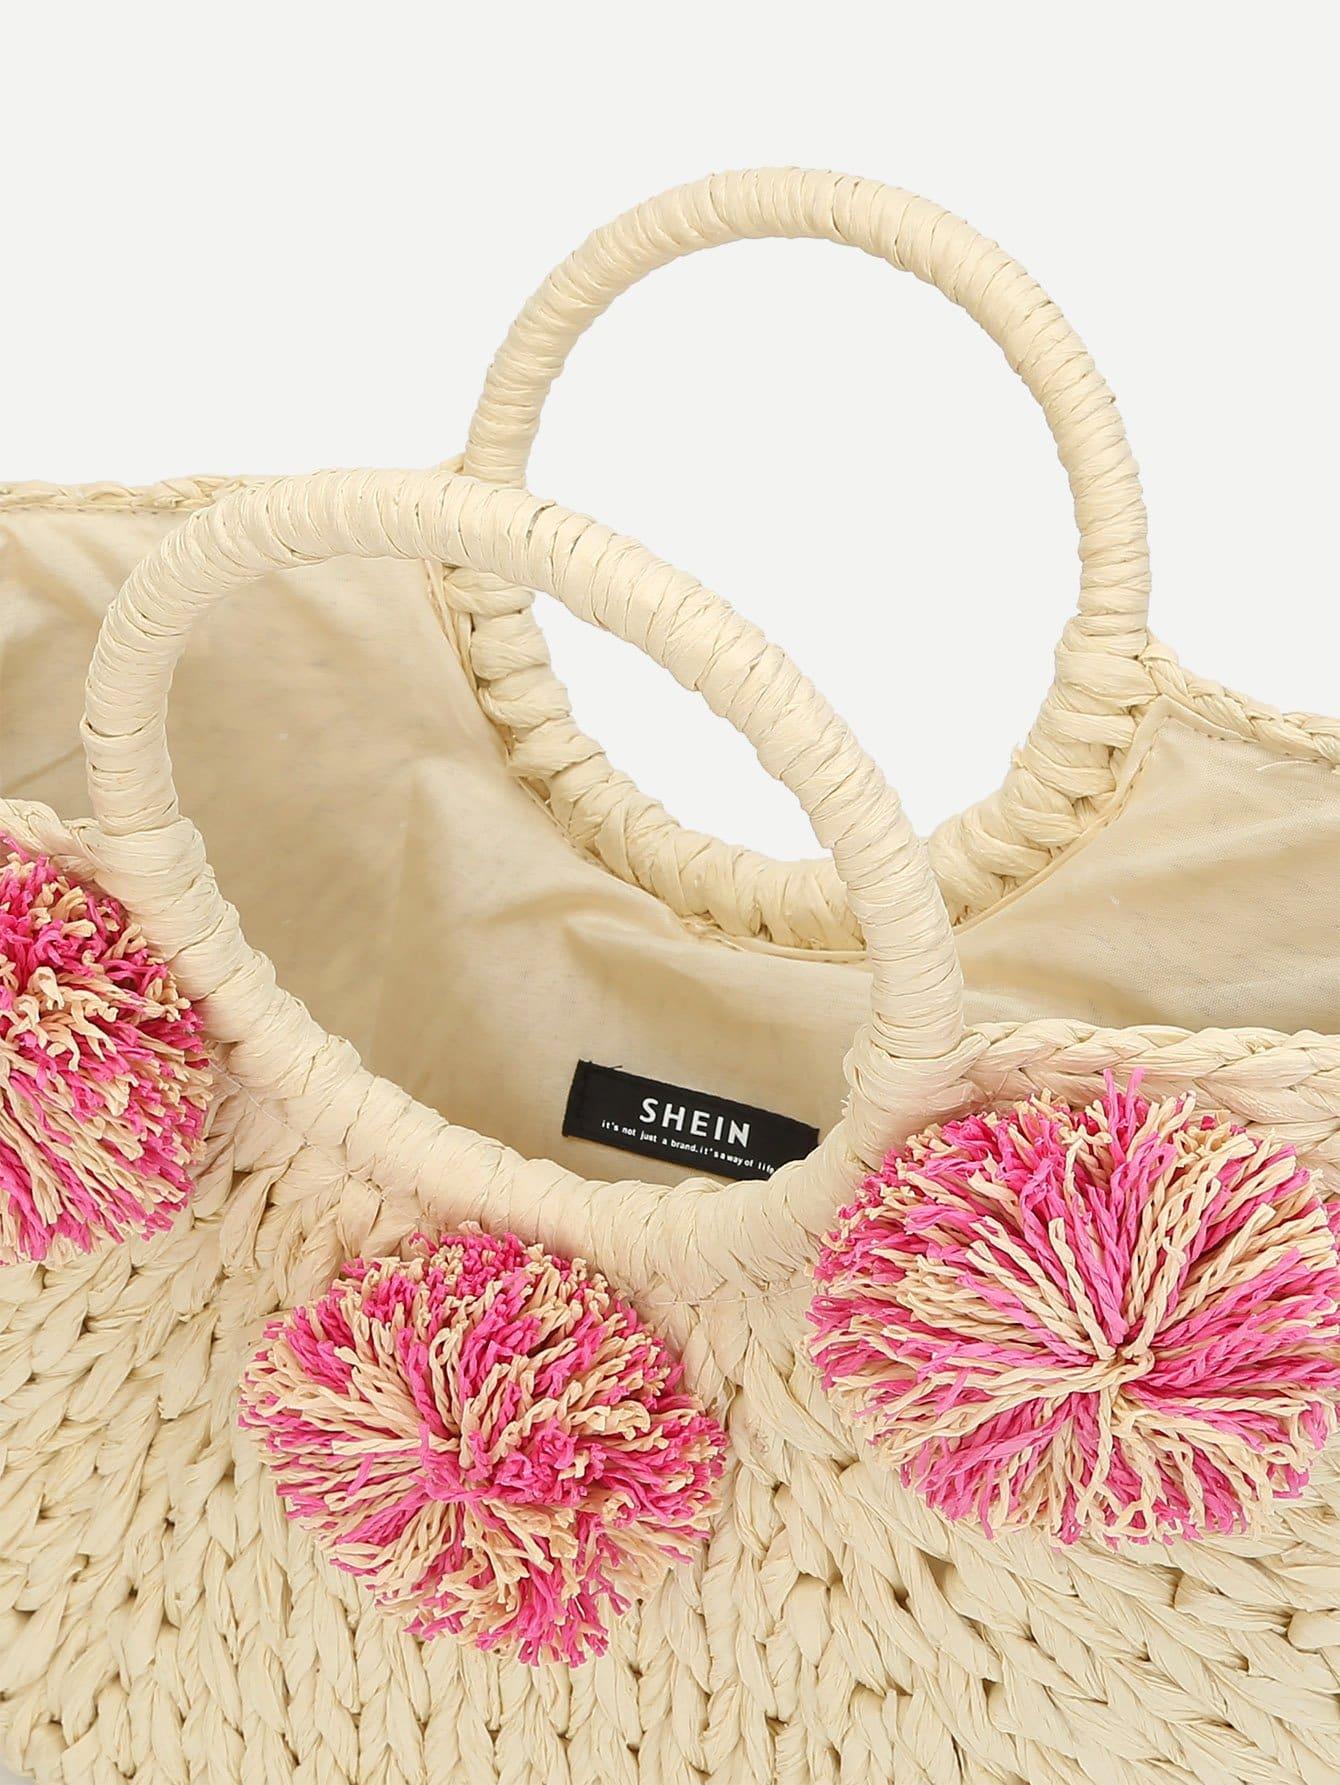 sac fourre tout en paille design de pompon french shein sheinside. Black Bedroom Furniture Sets. Home Design Ideas